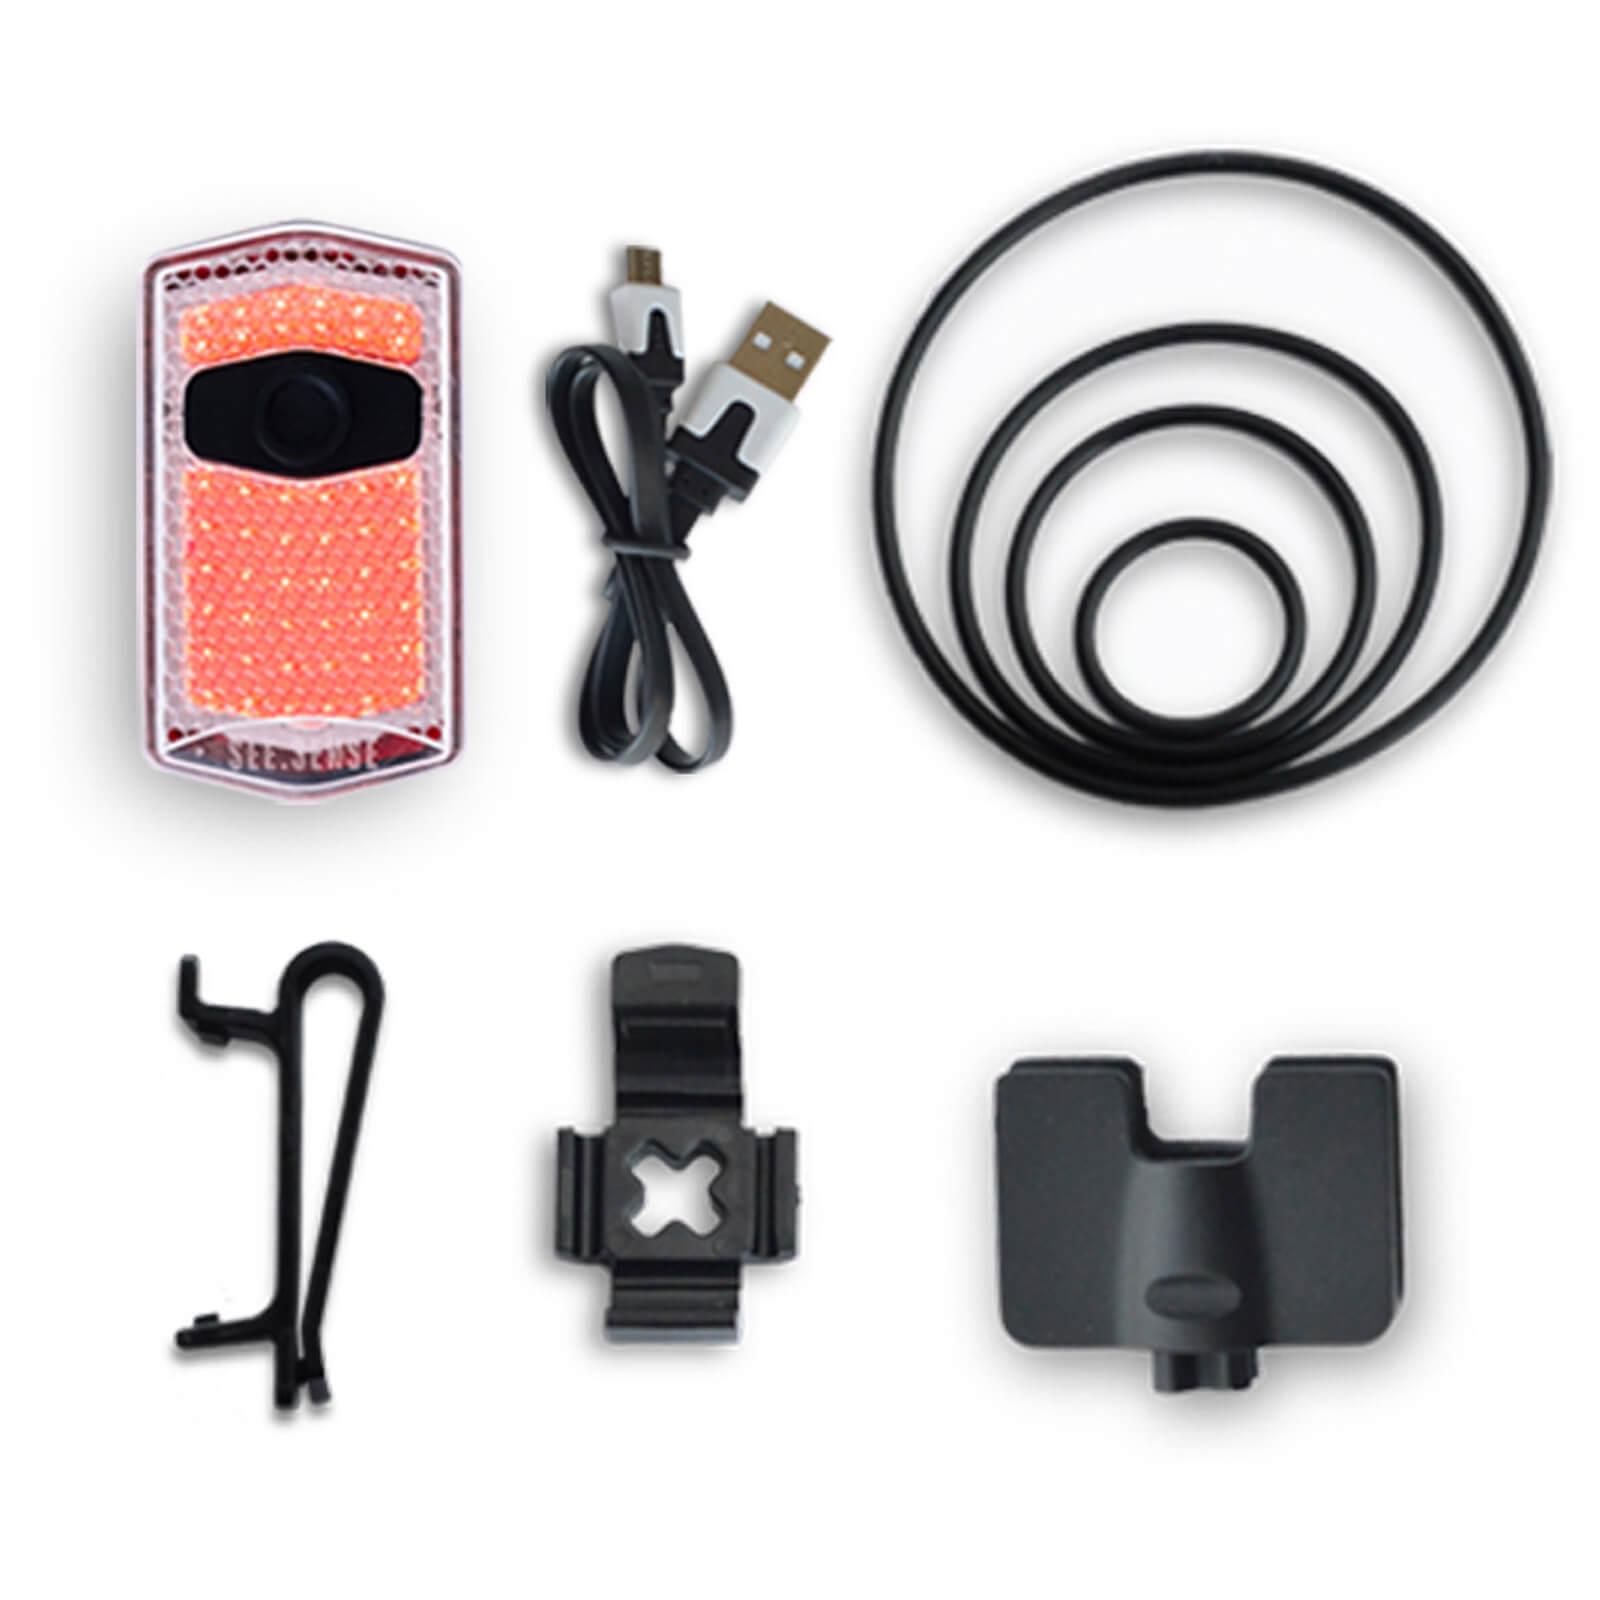 See Sense Ace Rear Cycle Light £17.99 ProBikeKit